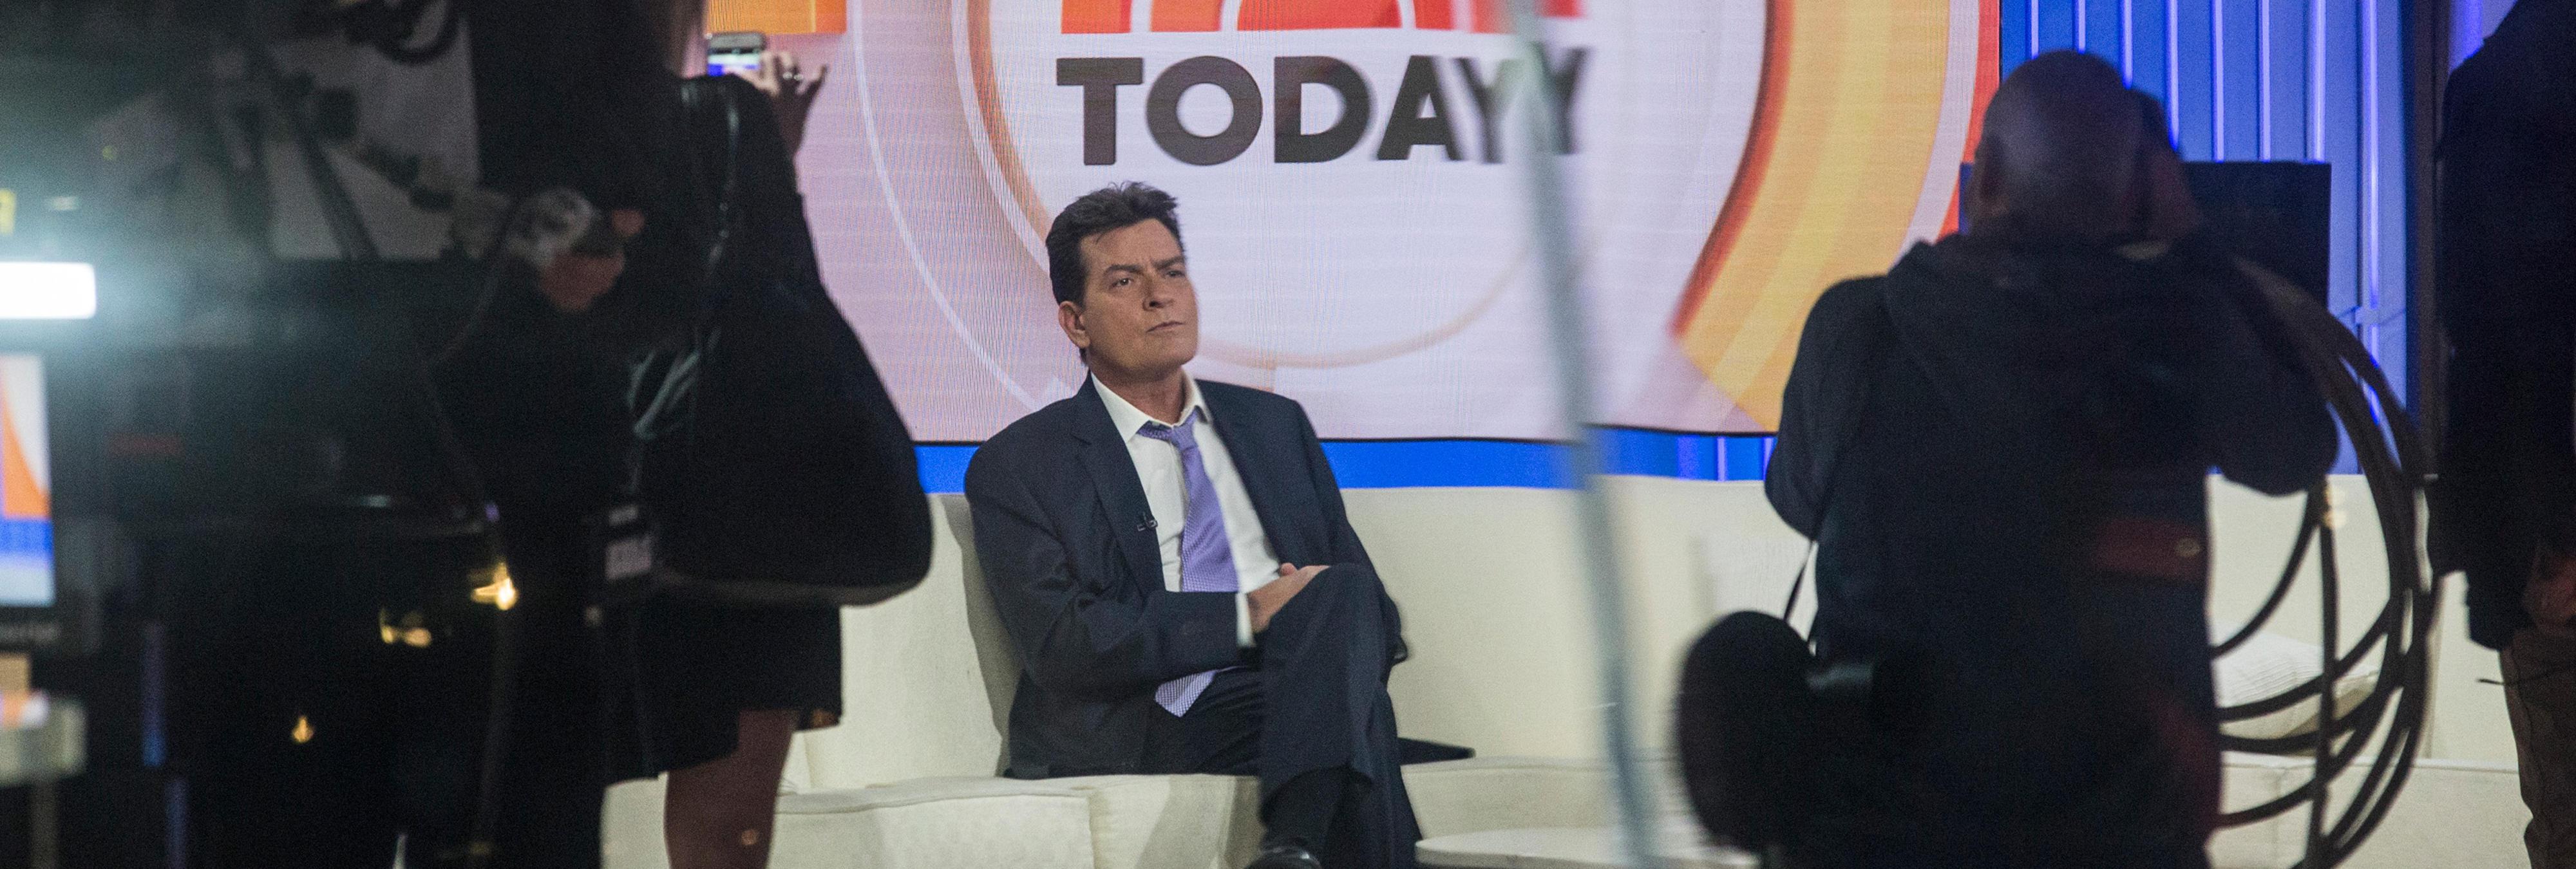 Charlie Sheen confiesa en directo que es VIH positivo